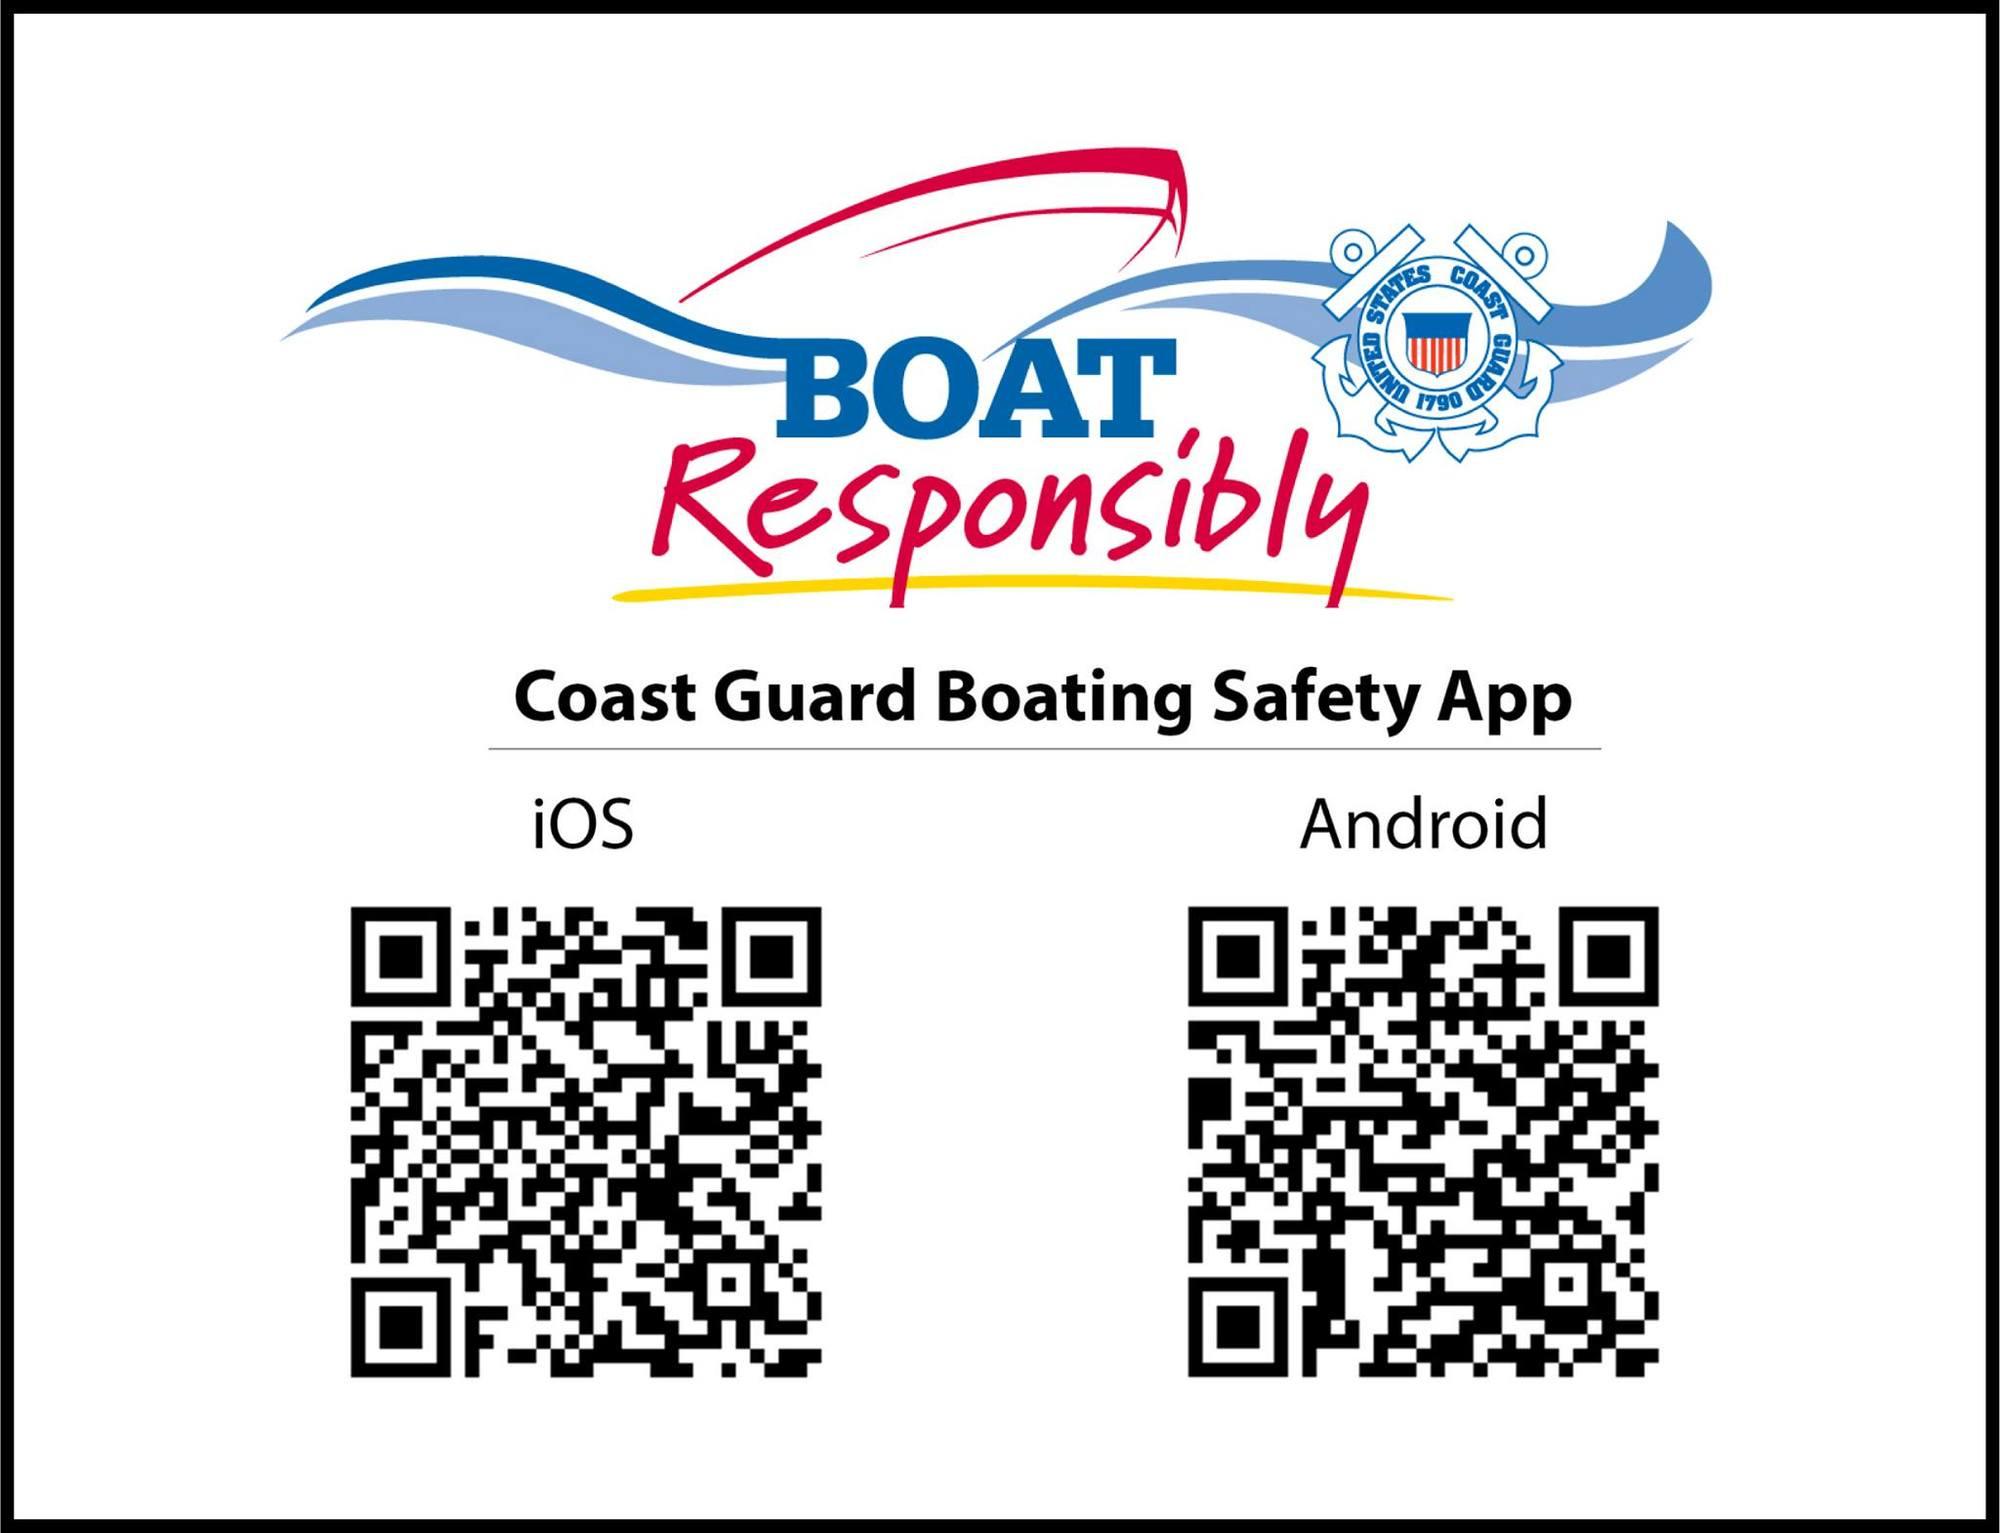 Boating Safety App QR codes